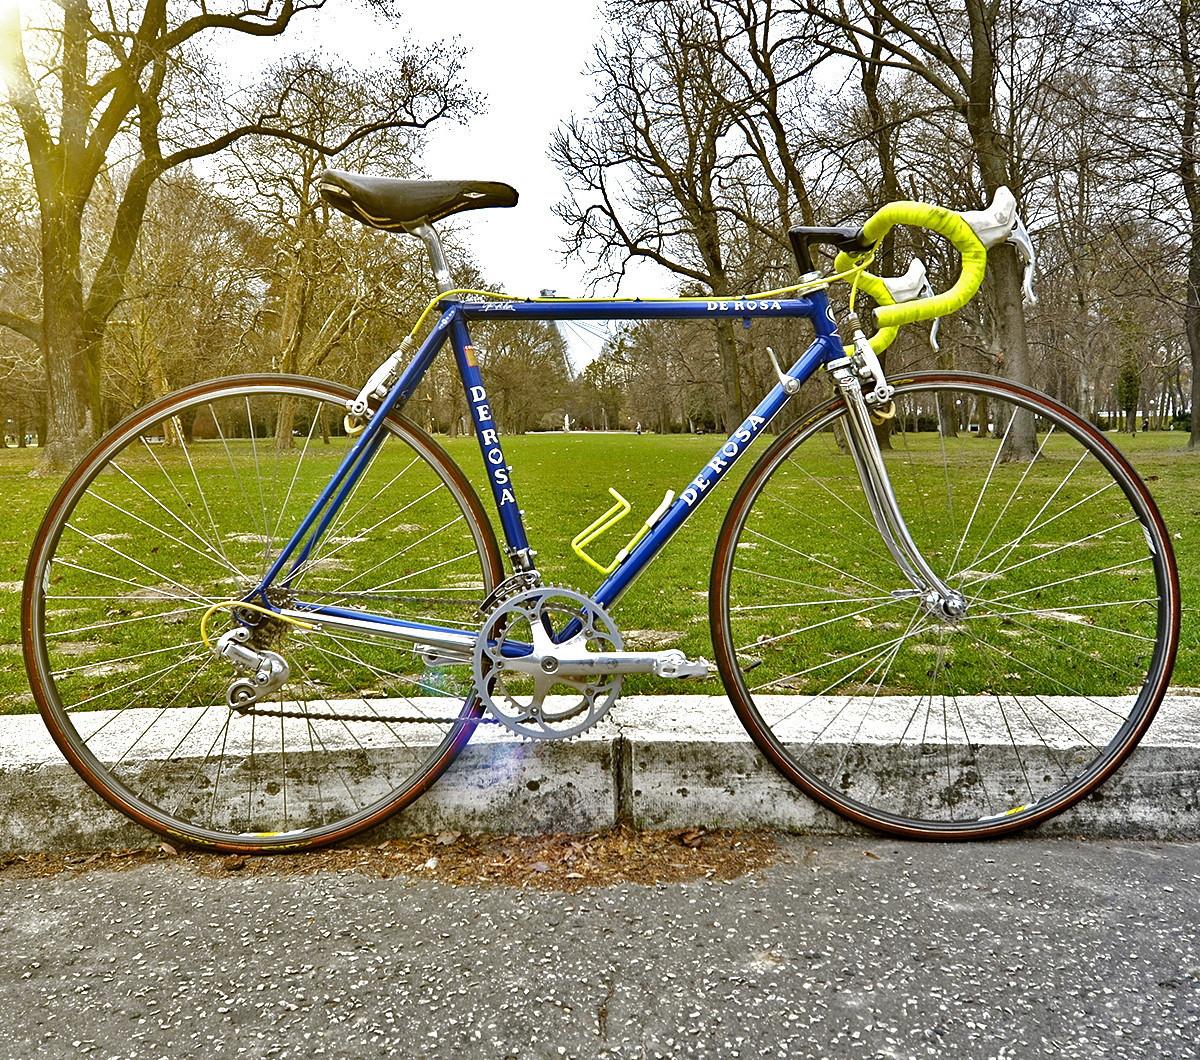 Bicykel skončil v Japonsku a jeho predaj dodnes ľutujem.